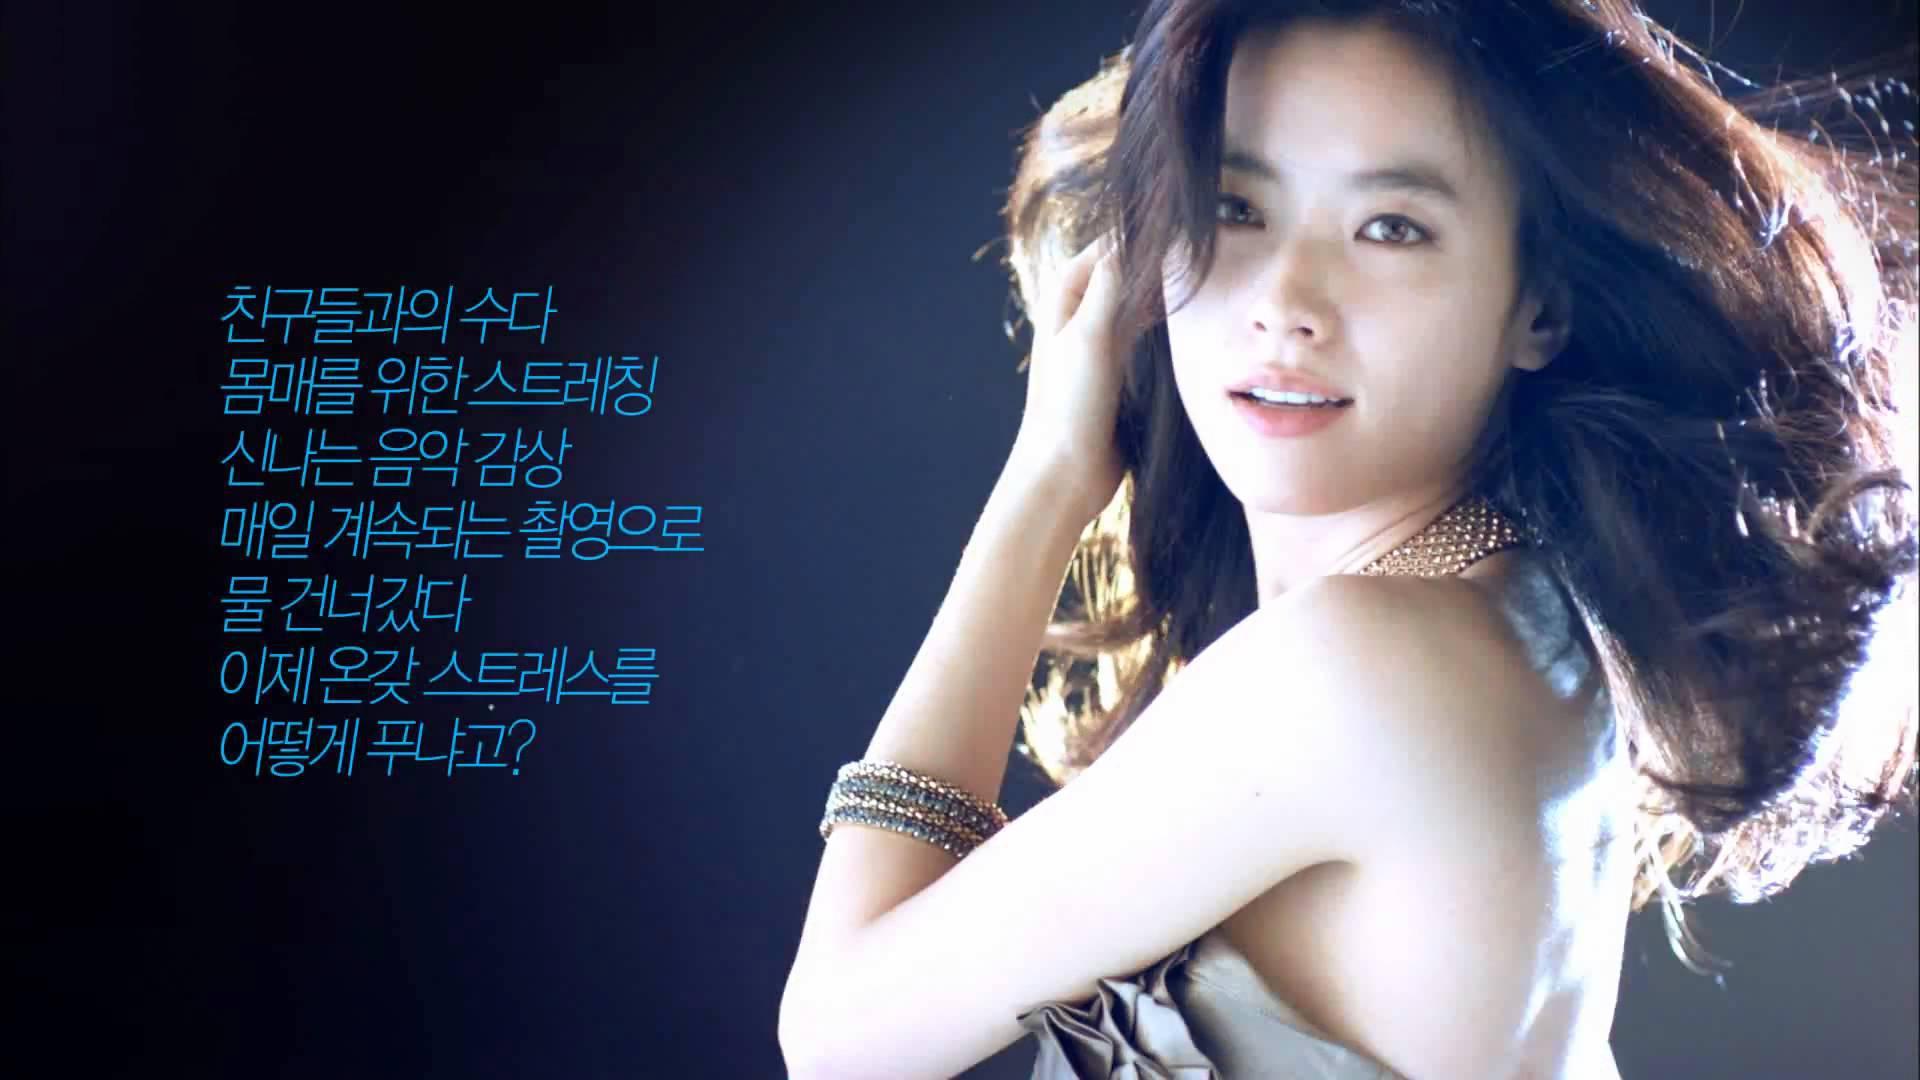 Han Hyo Joo Pictures